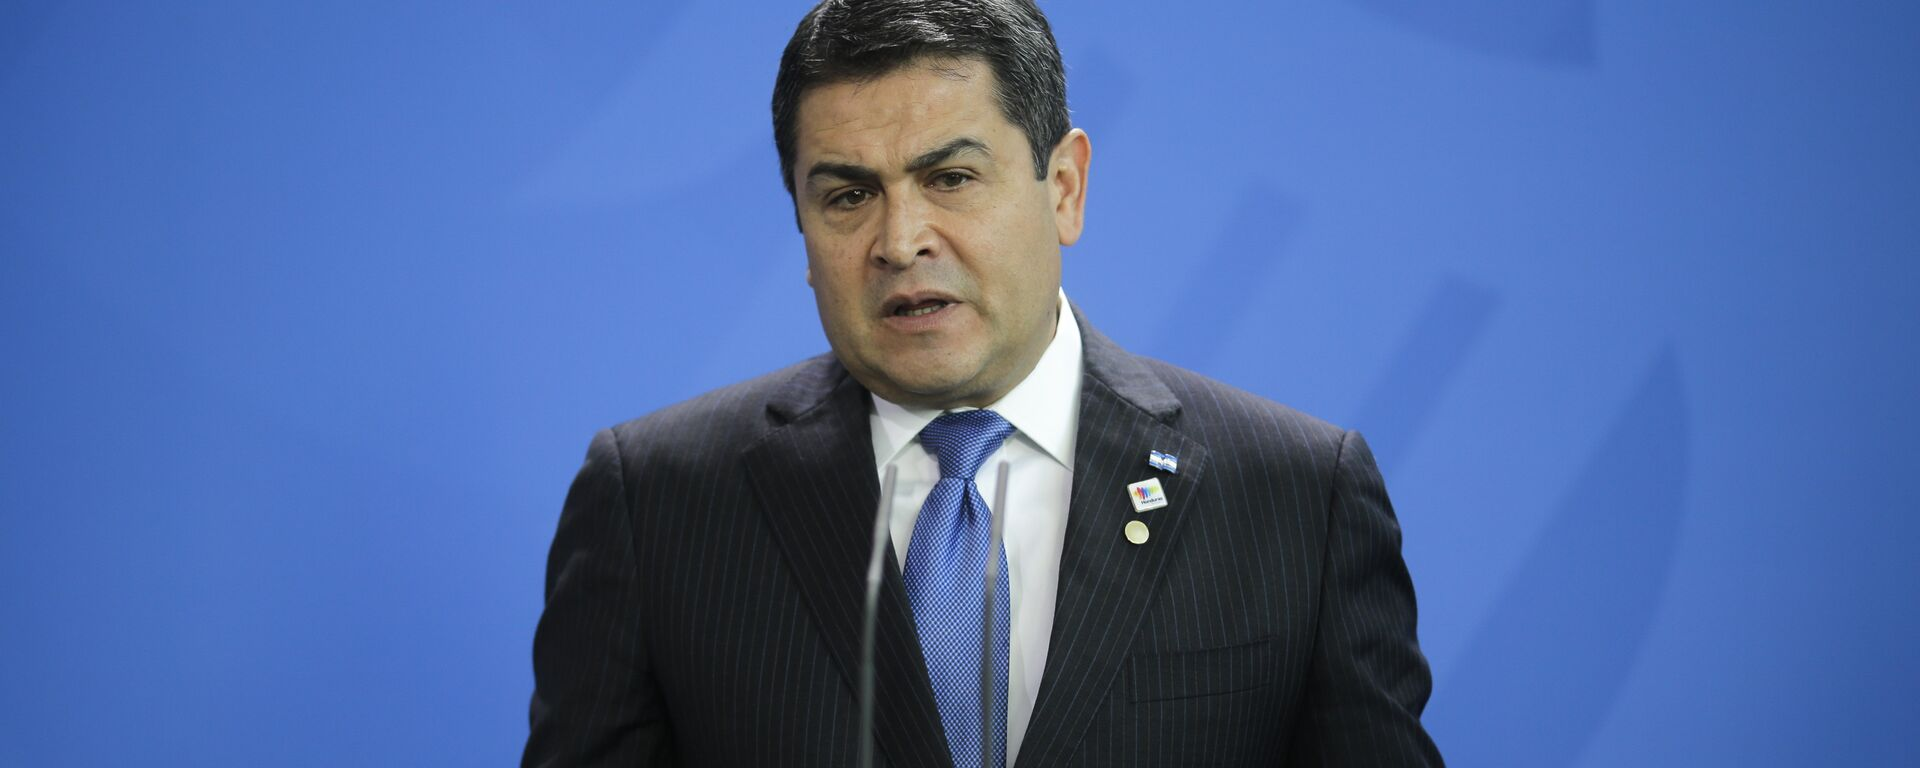 Juan Orlando Hernández, presidente de Honduras - Sputnik Mundo, 1920, 31.01.2021